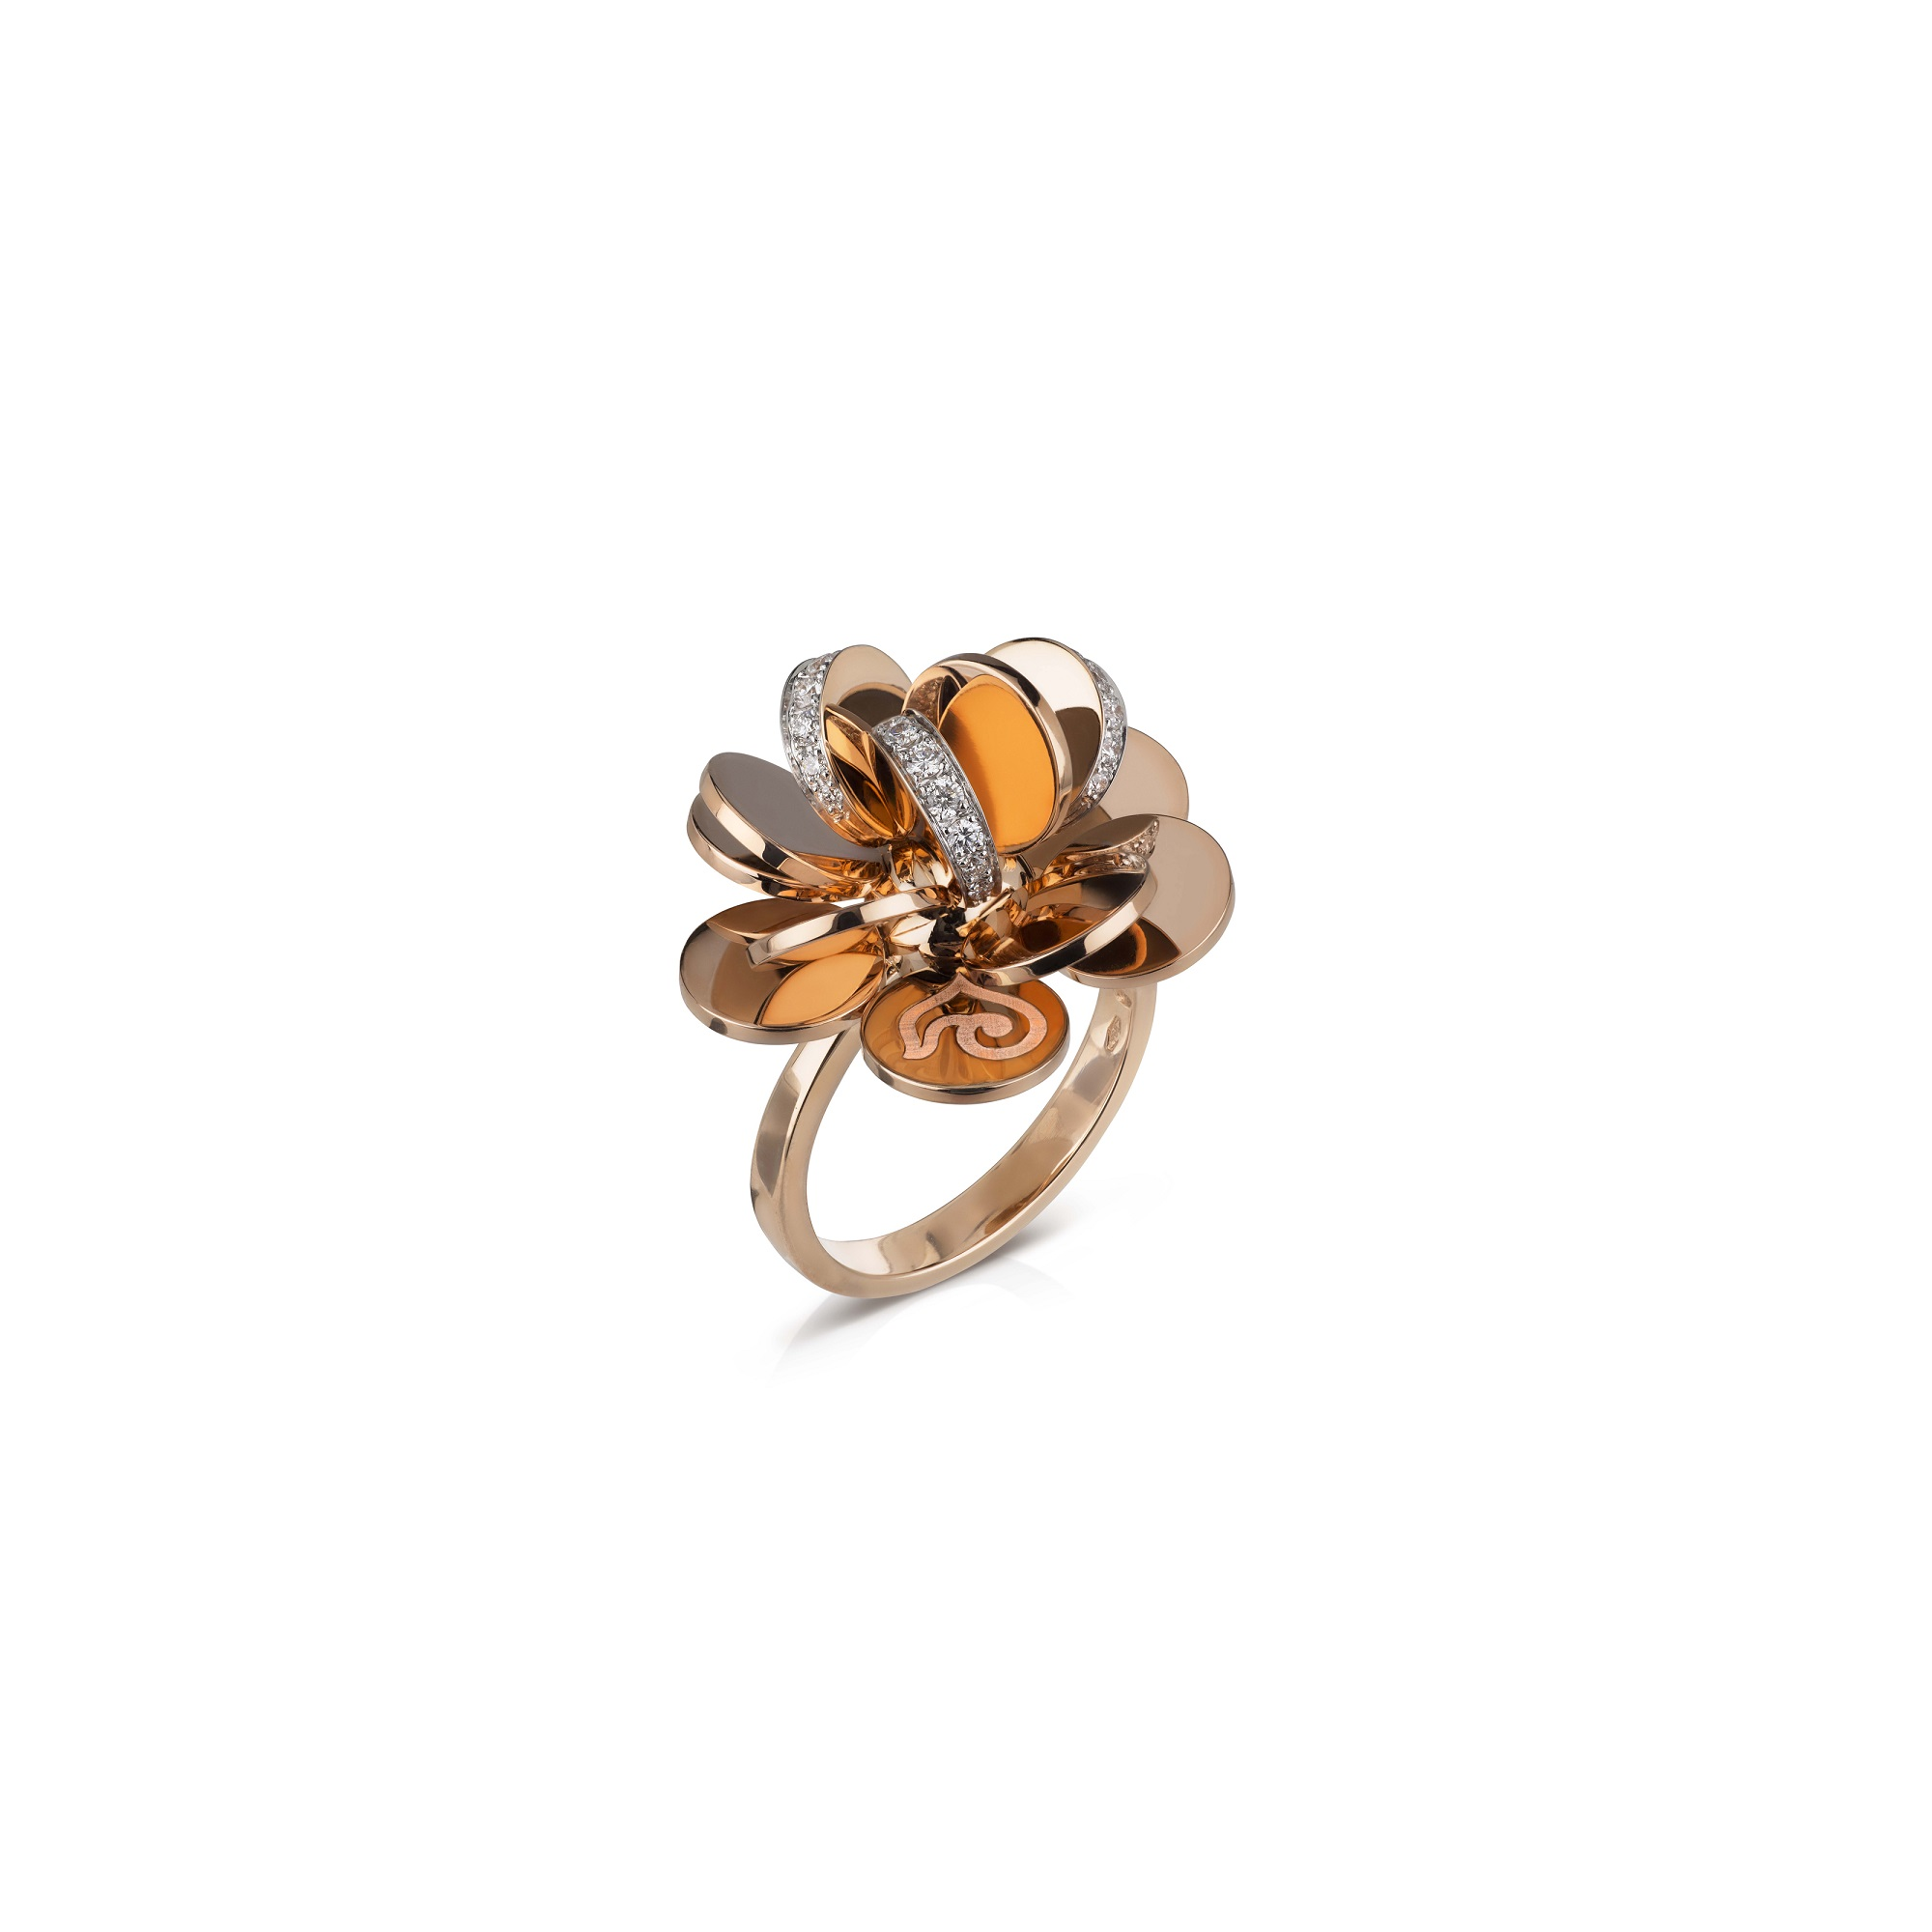 Chantecler Paillettes Ring aus Roségold mit Brillaten